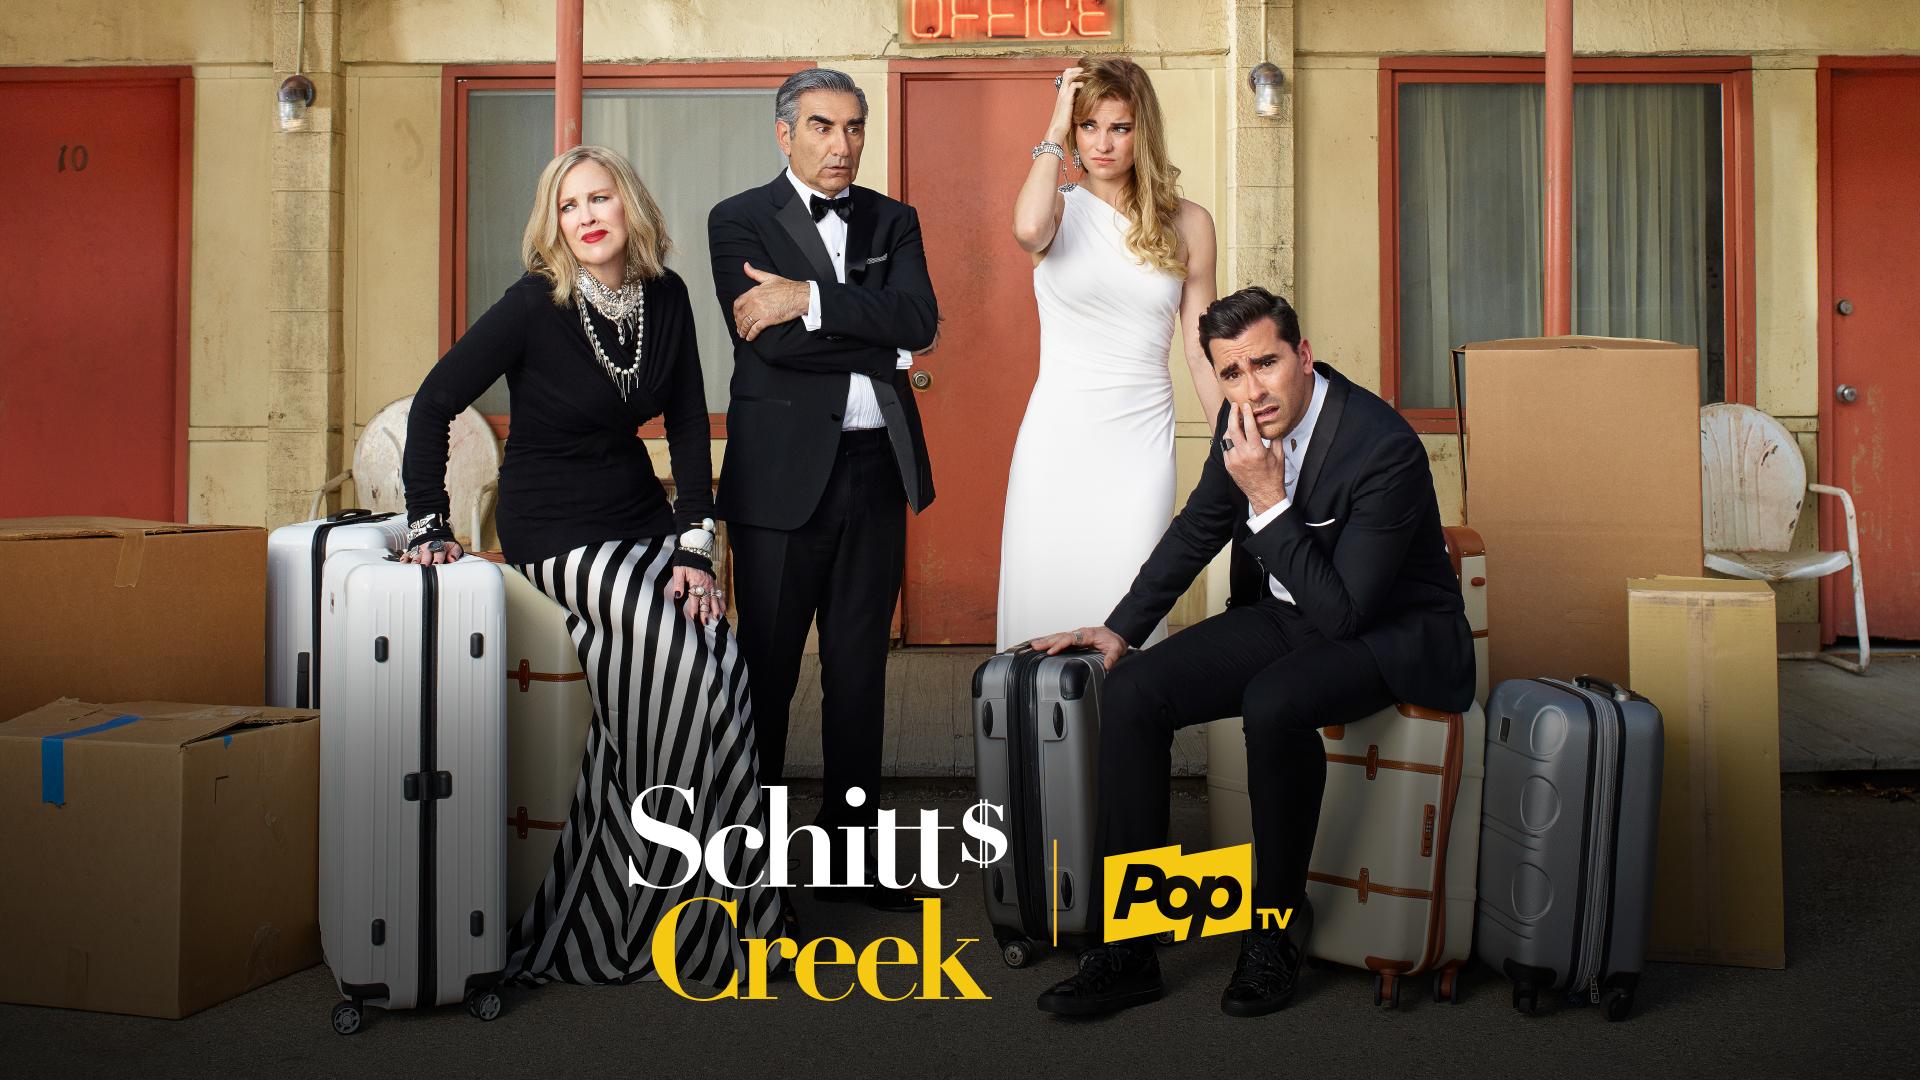 Schitt's Creek Season 1 (Uncensored)